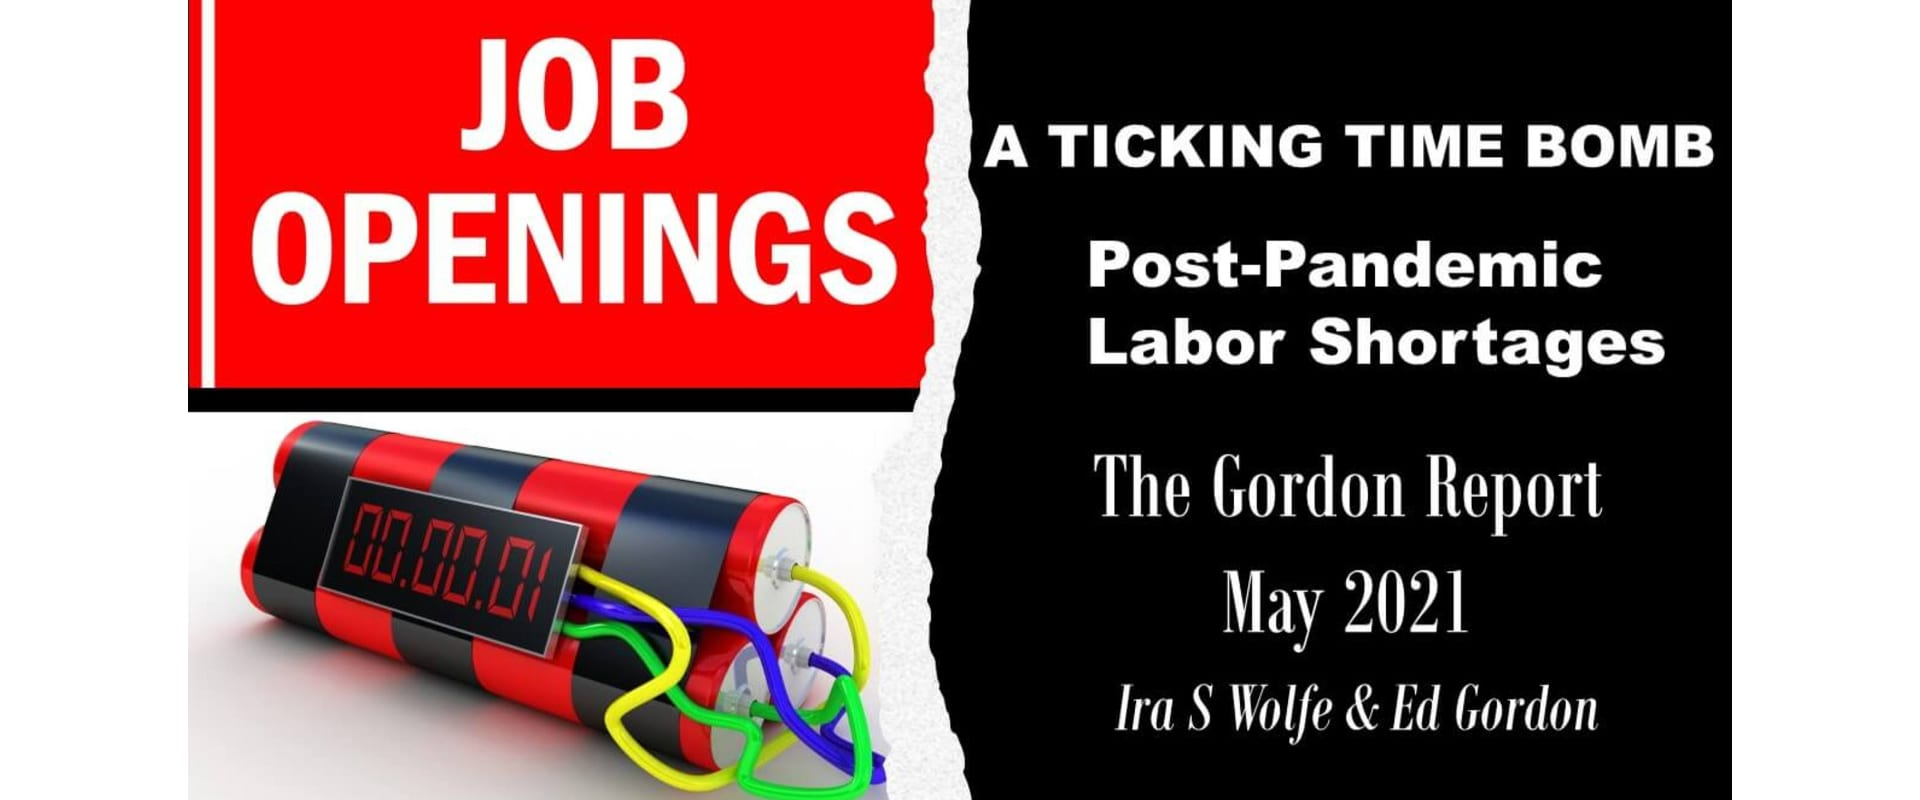 ticking time bomb, post-pandemic, labor shortages, gordon report